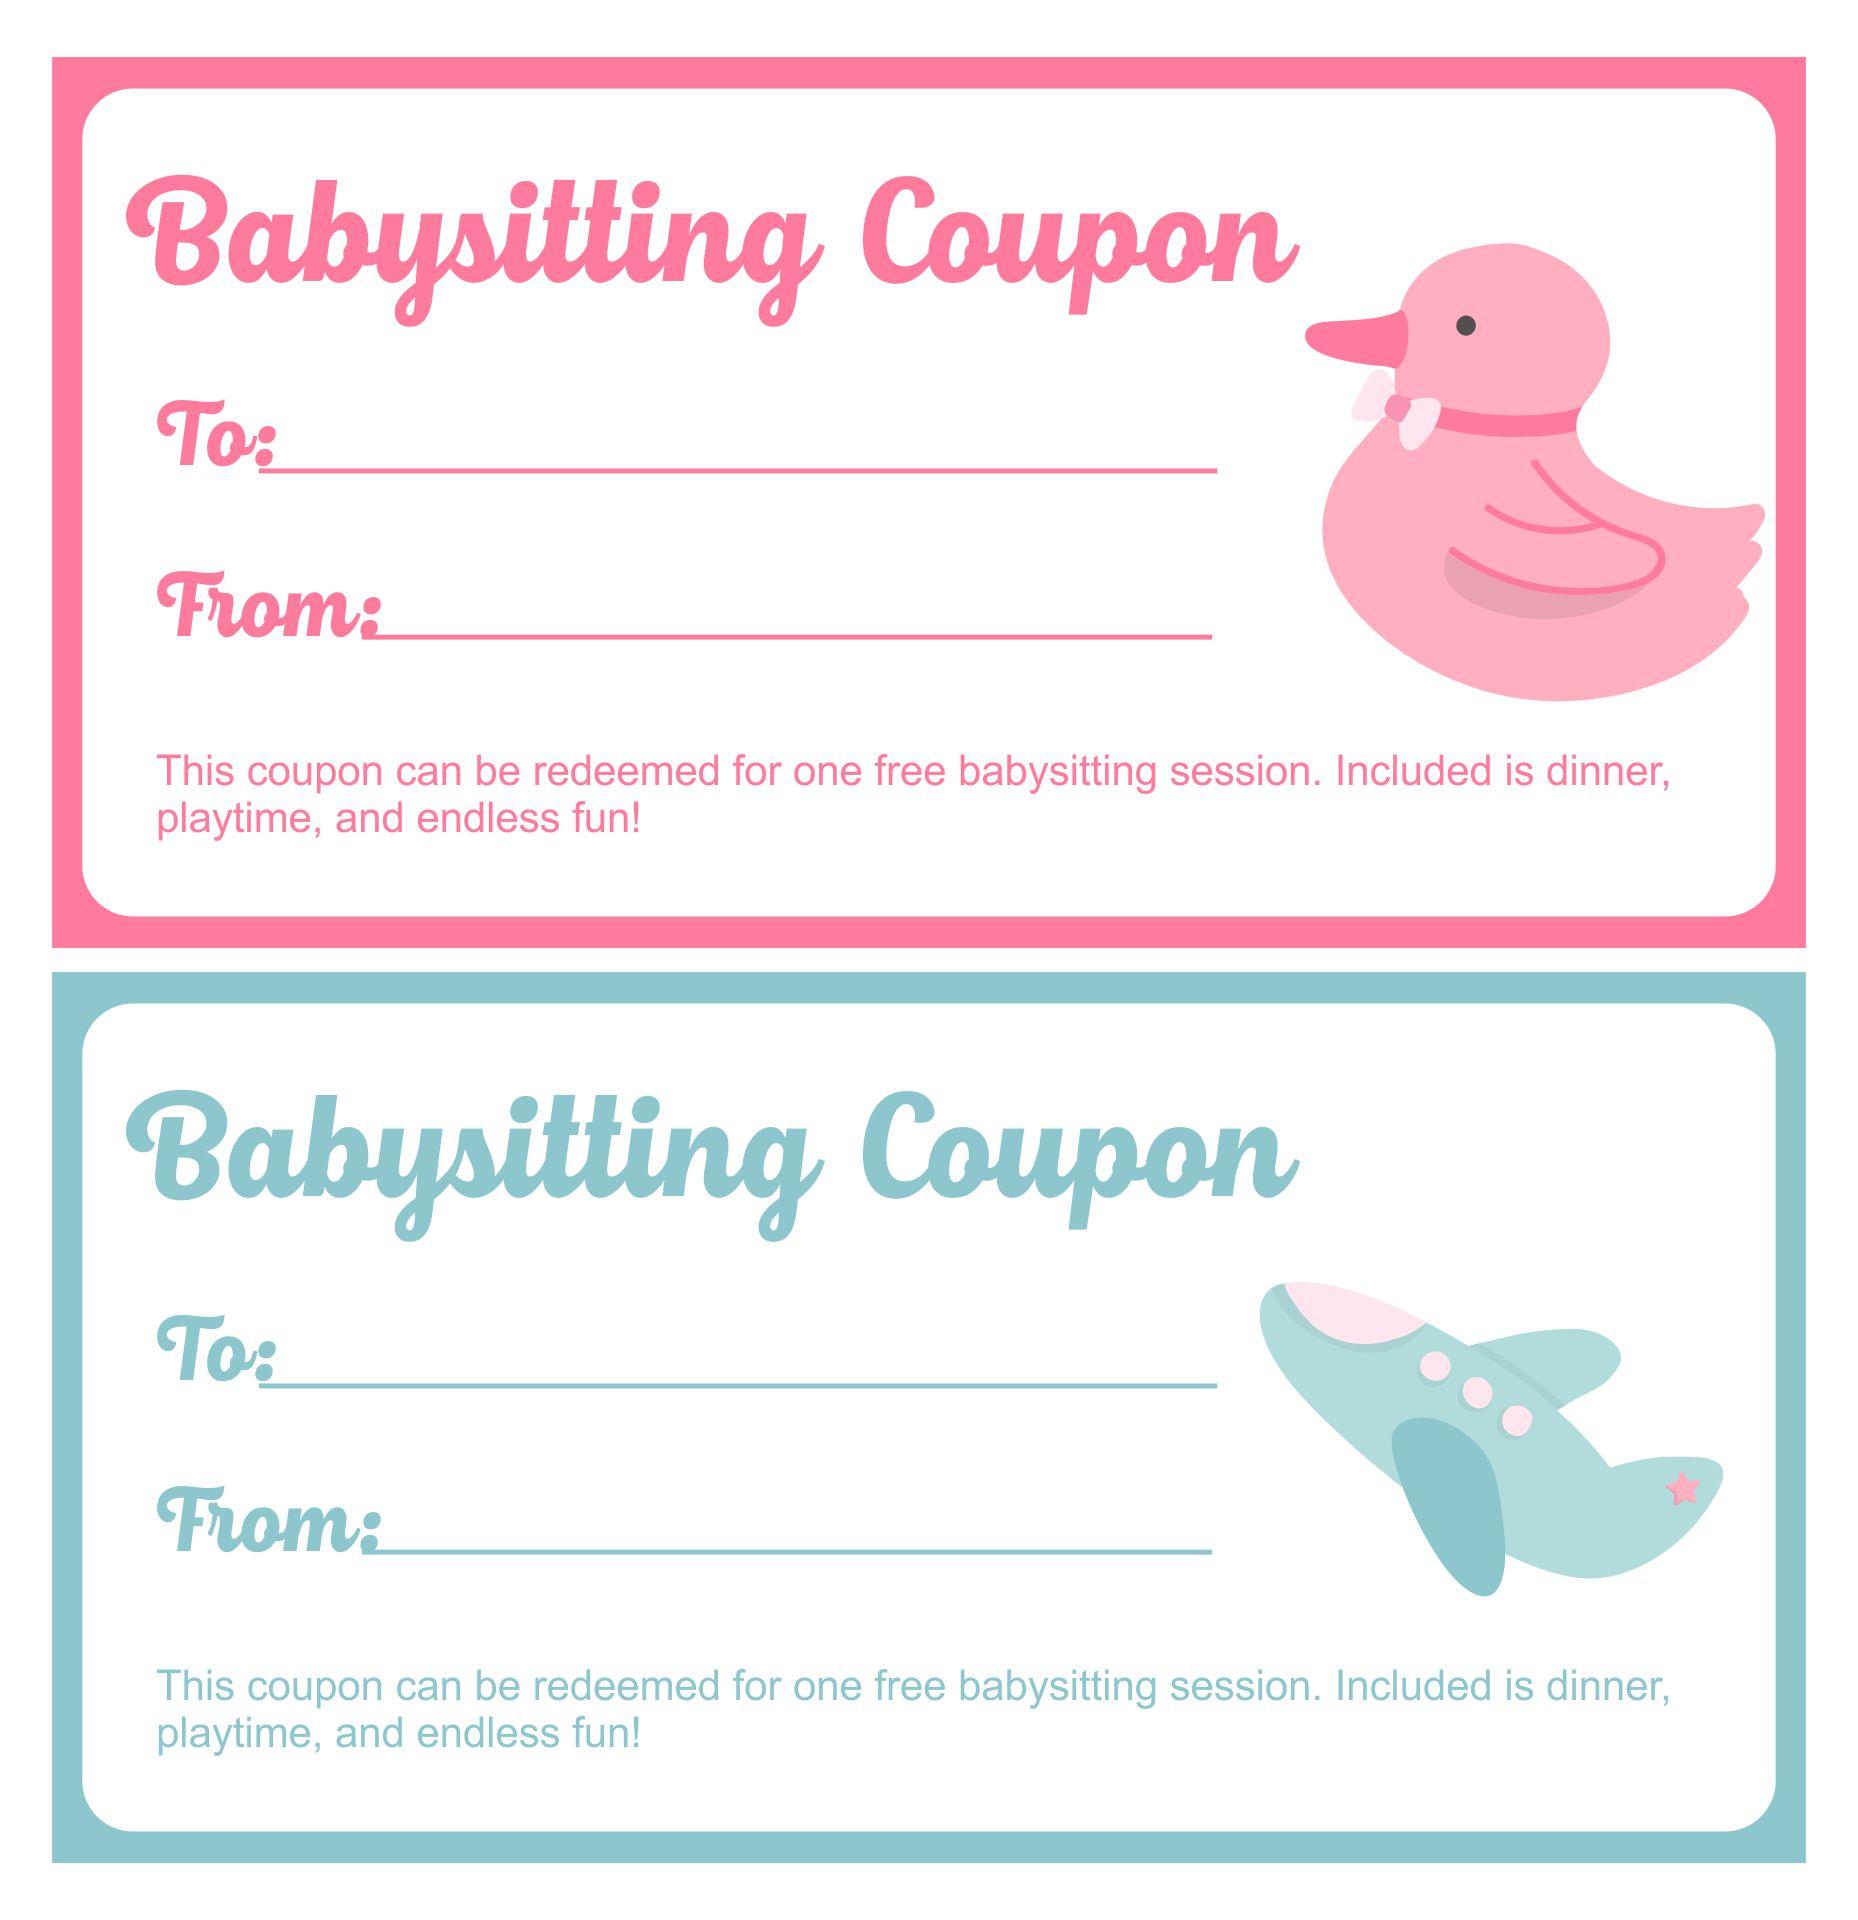 Babysitting Coupon Template